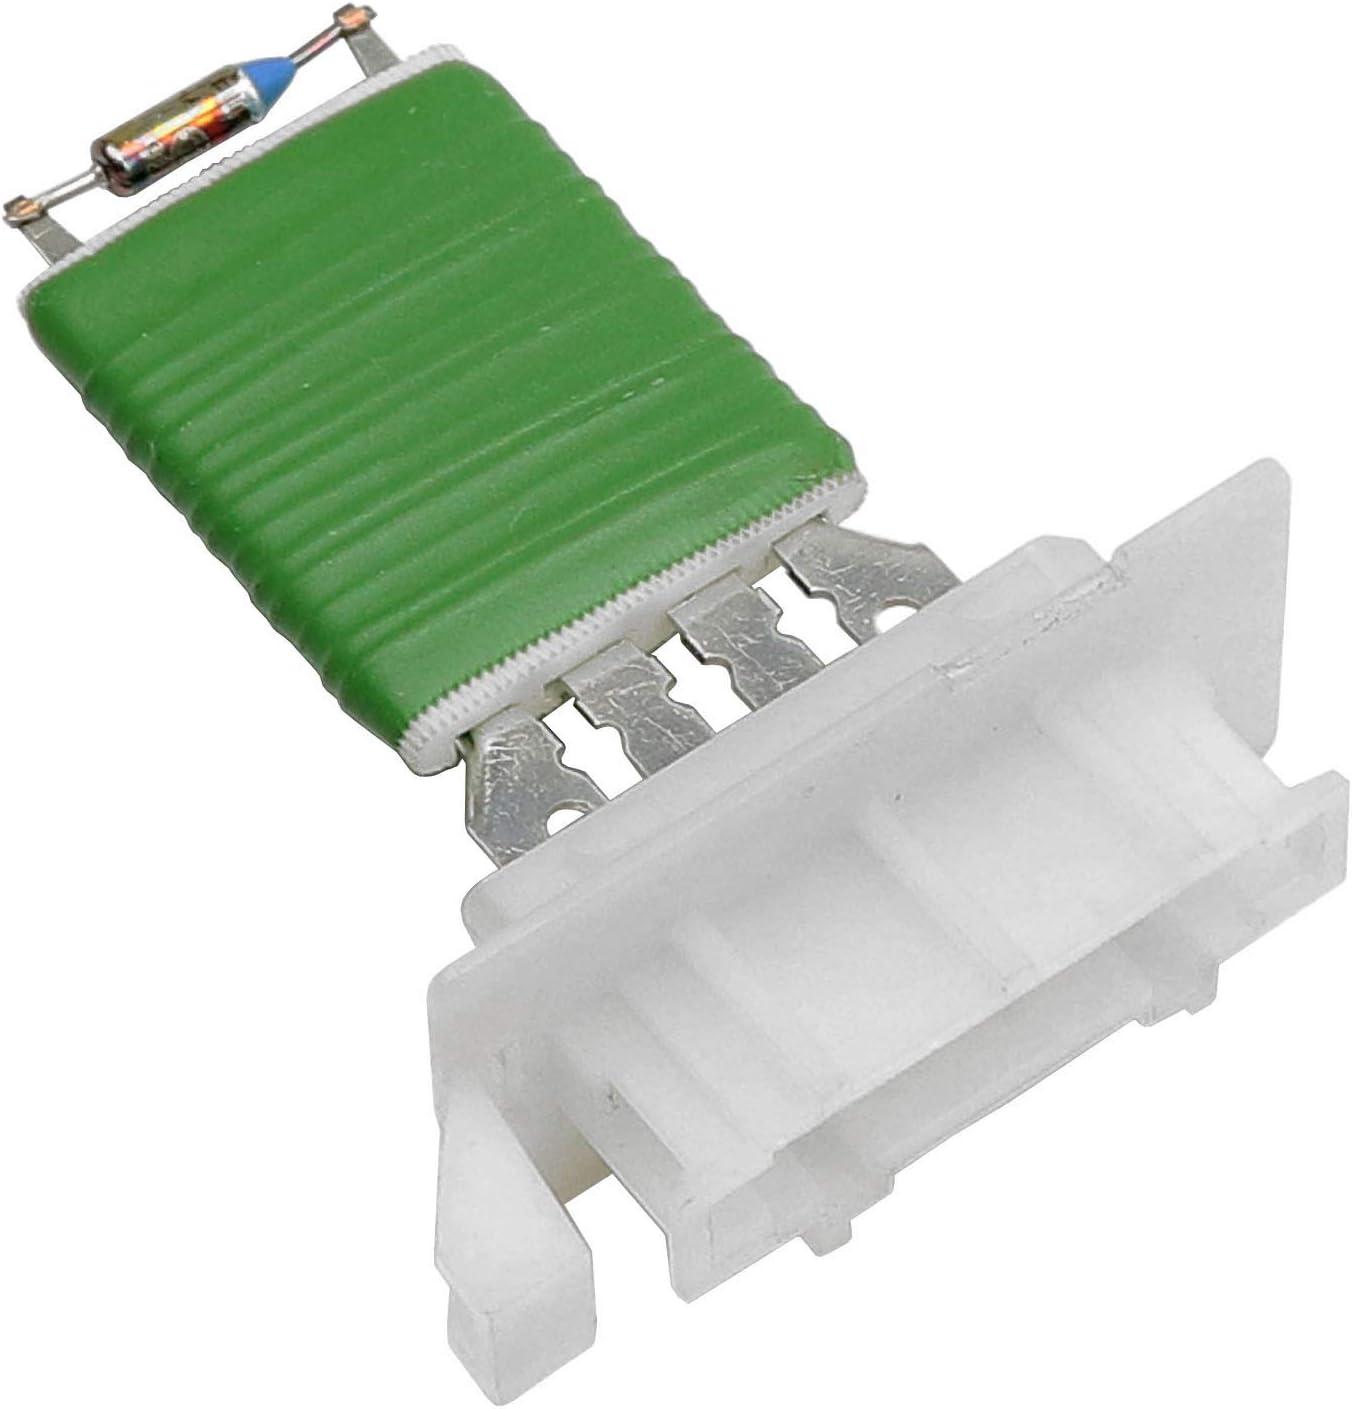 BECKARNLEY 204-0105 All stores are sold Blower Japan Maker New Motor Pack Resistor 1